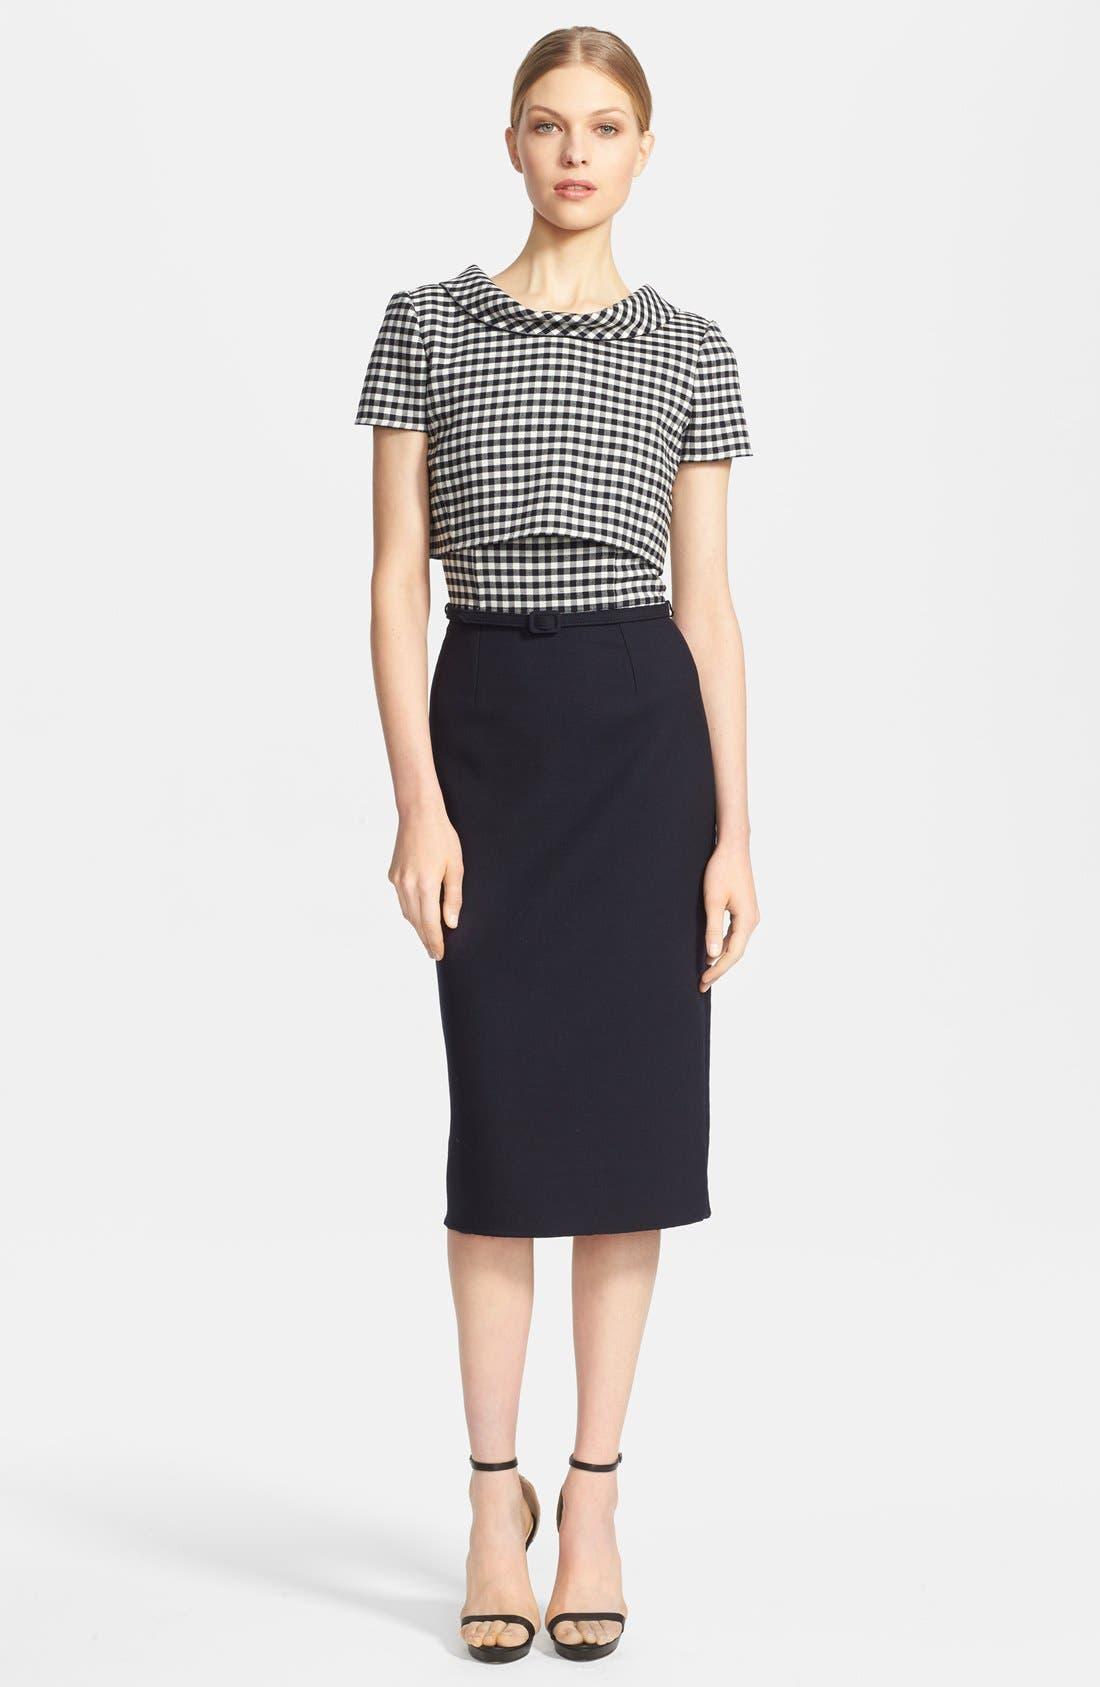 Alternate Image 1 Selected - Oscar de la Renta Stretch Wool Pencil Dress